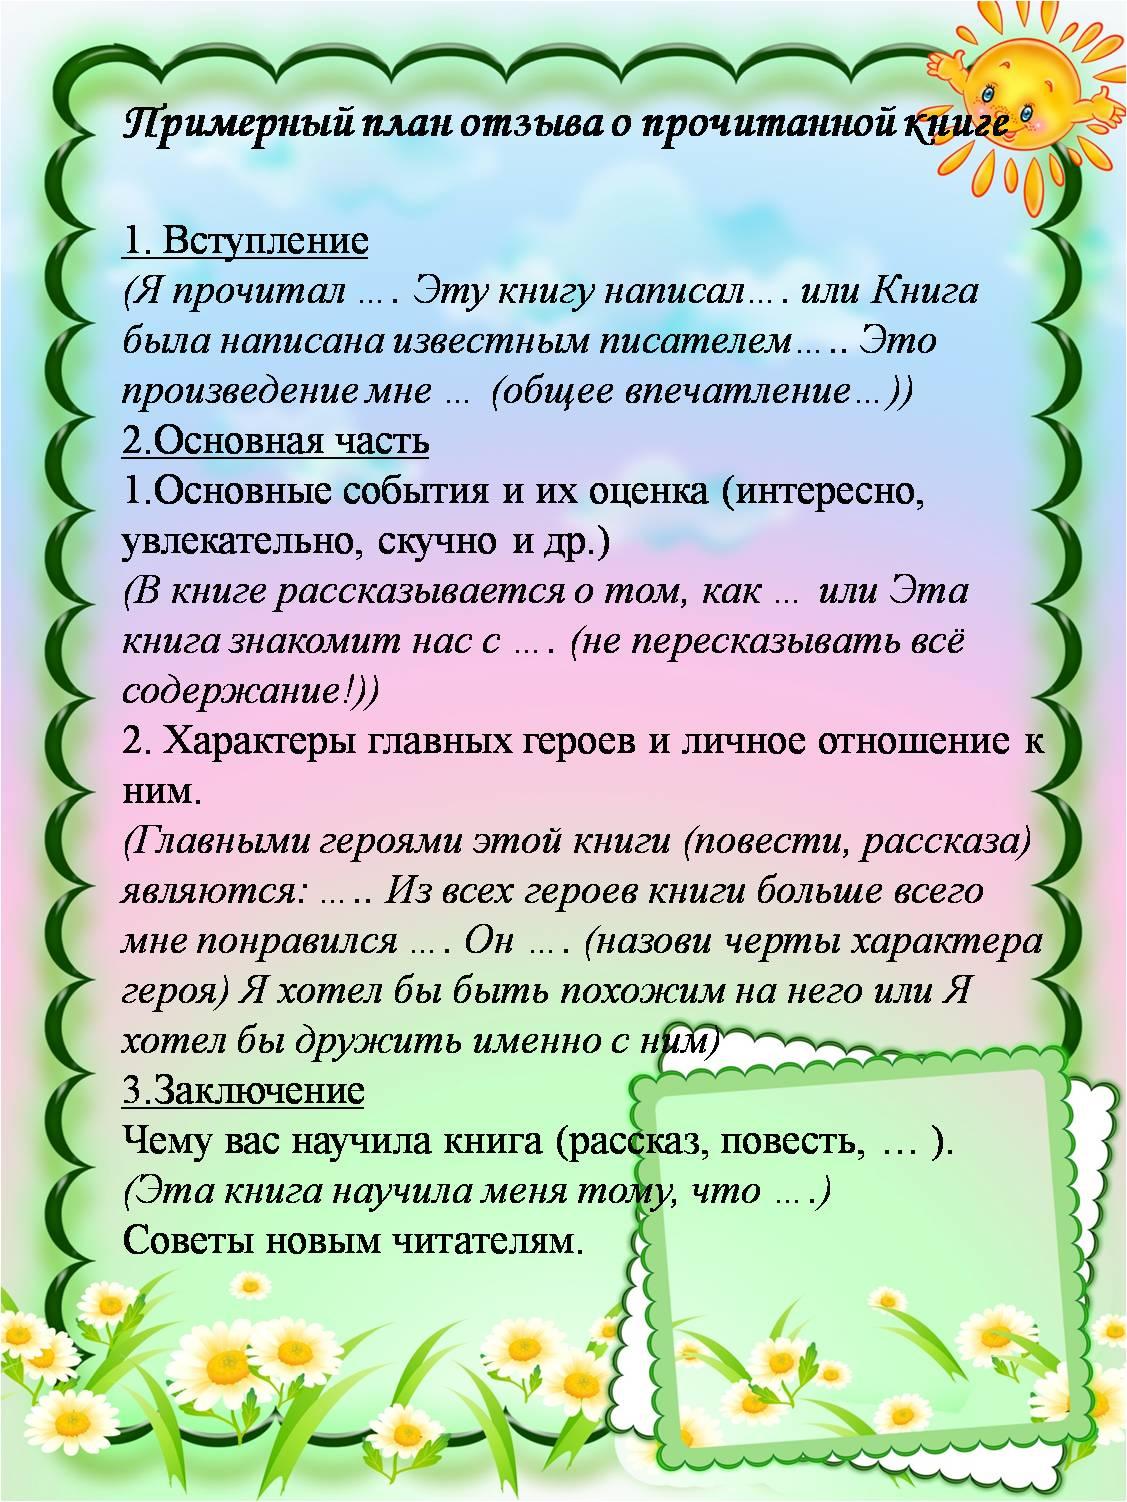 C:\Users\Наталья\Desktop\читательский\pamjatka.jpg